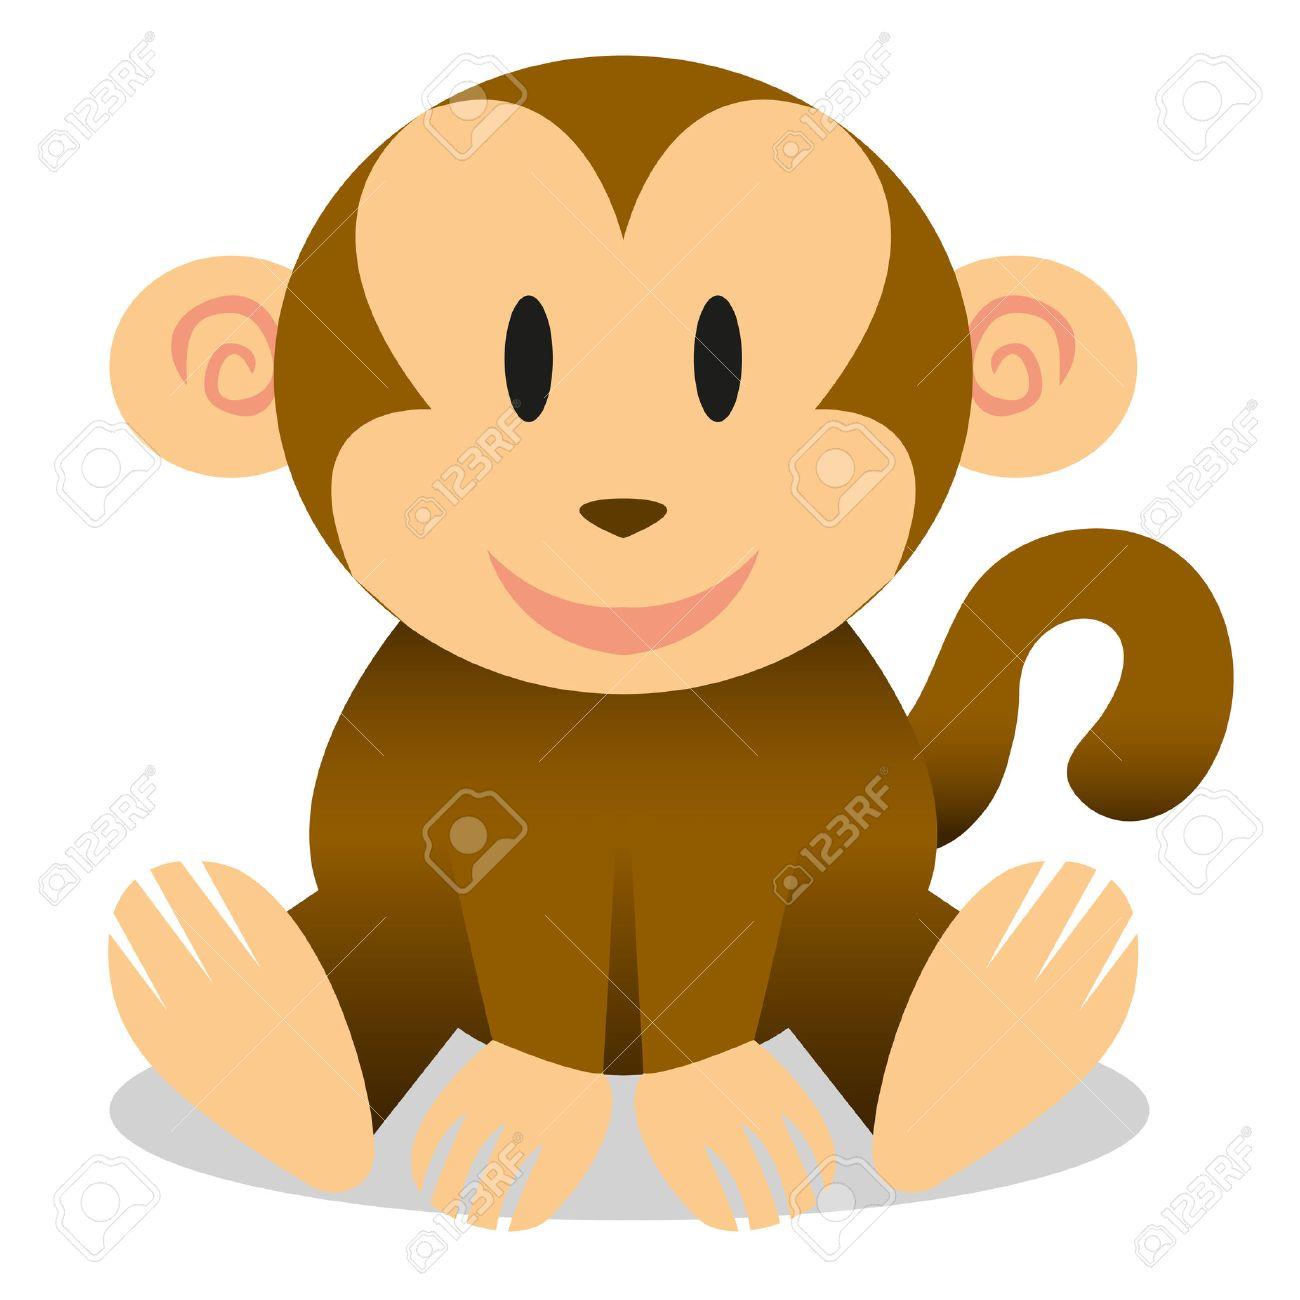 Cartoon baby monkey pictures